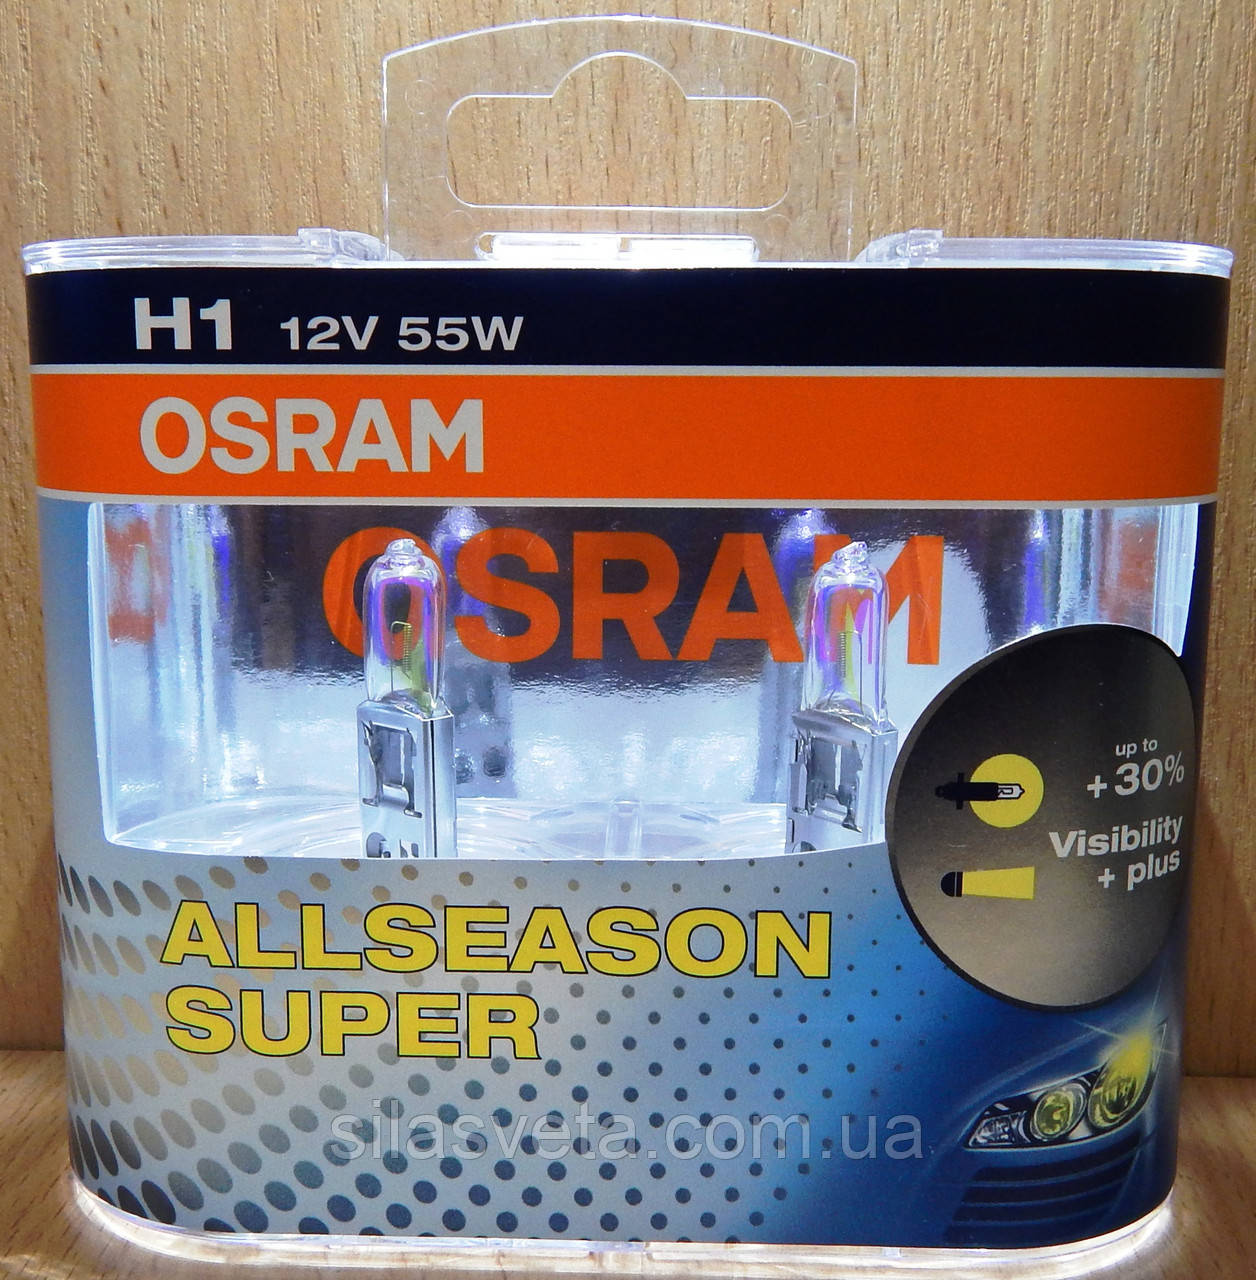 "Автомобильные галогенные лампы ""OSRAM"" (H1) (ALLSEASON SUPER) (+30%) (12V) (55W)"